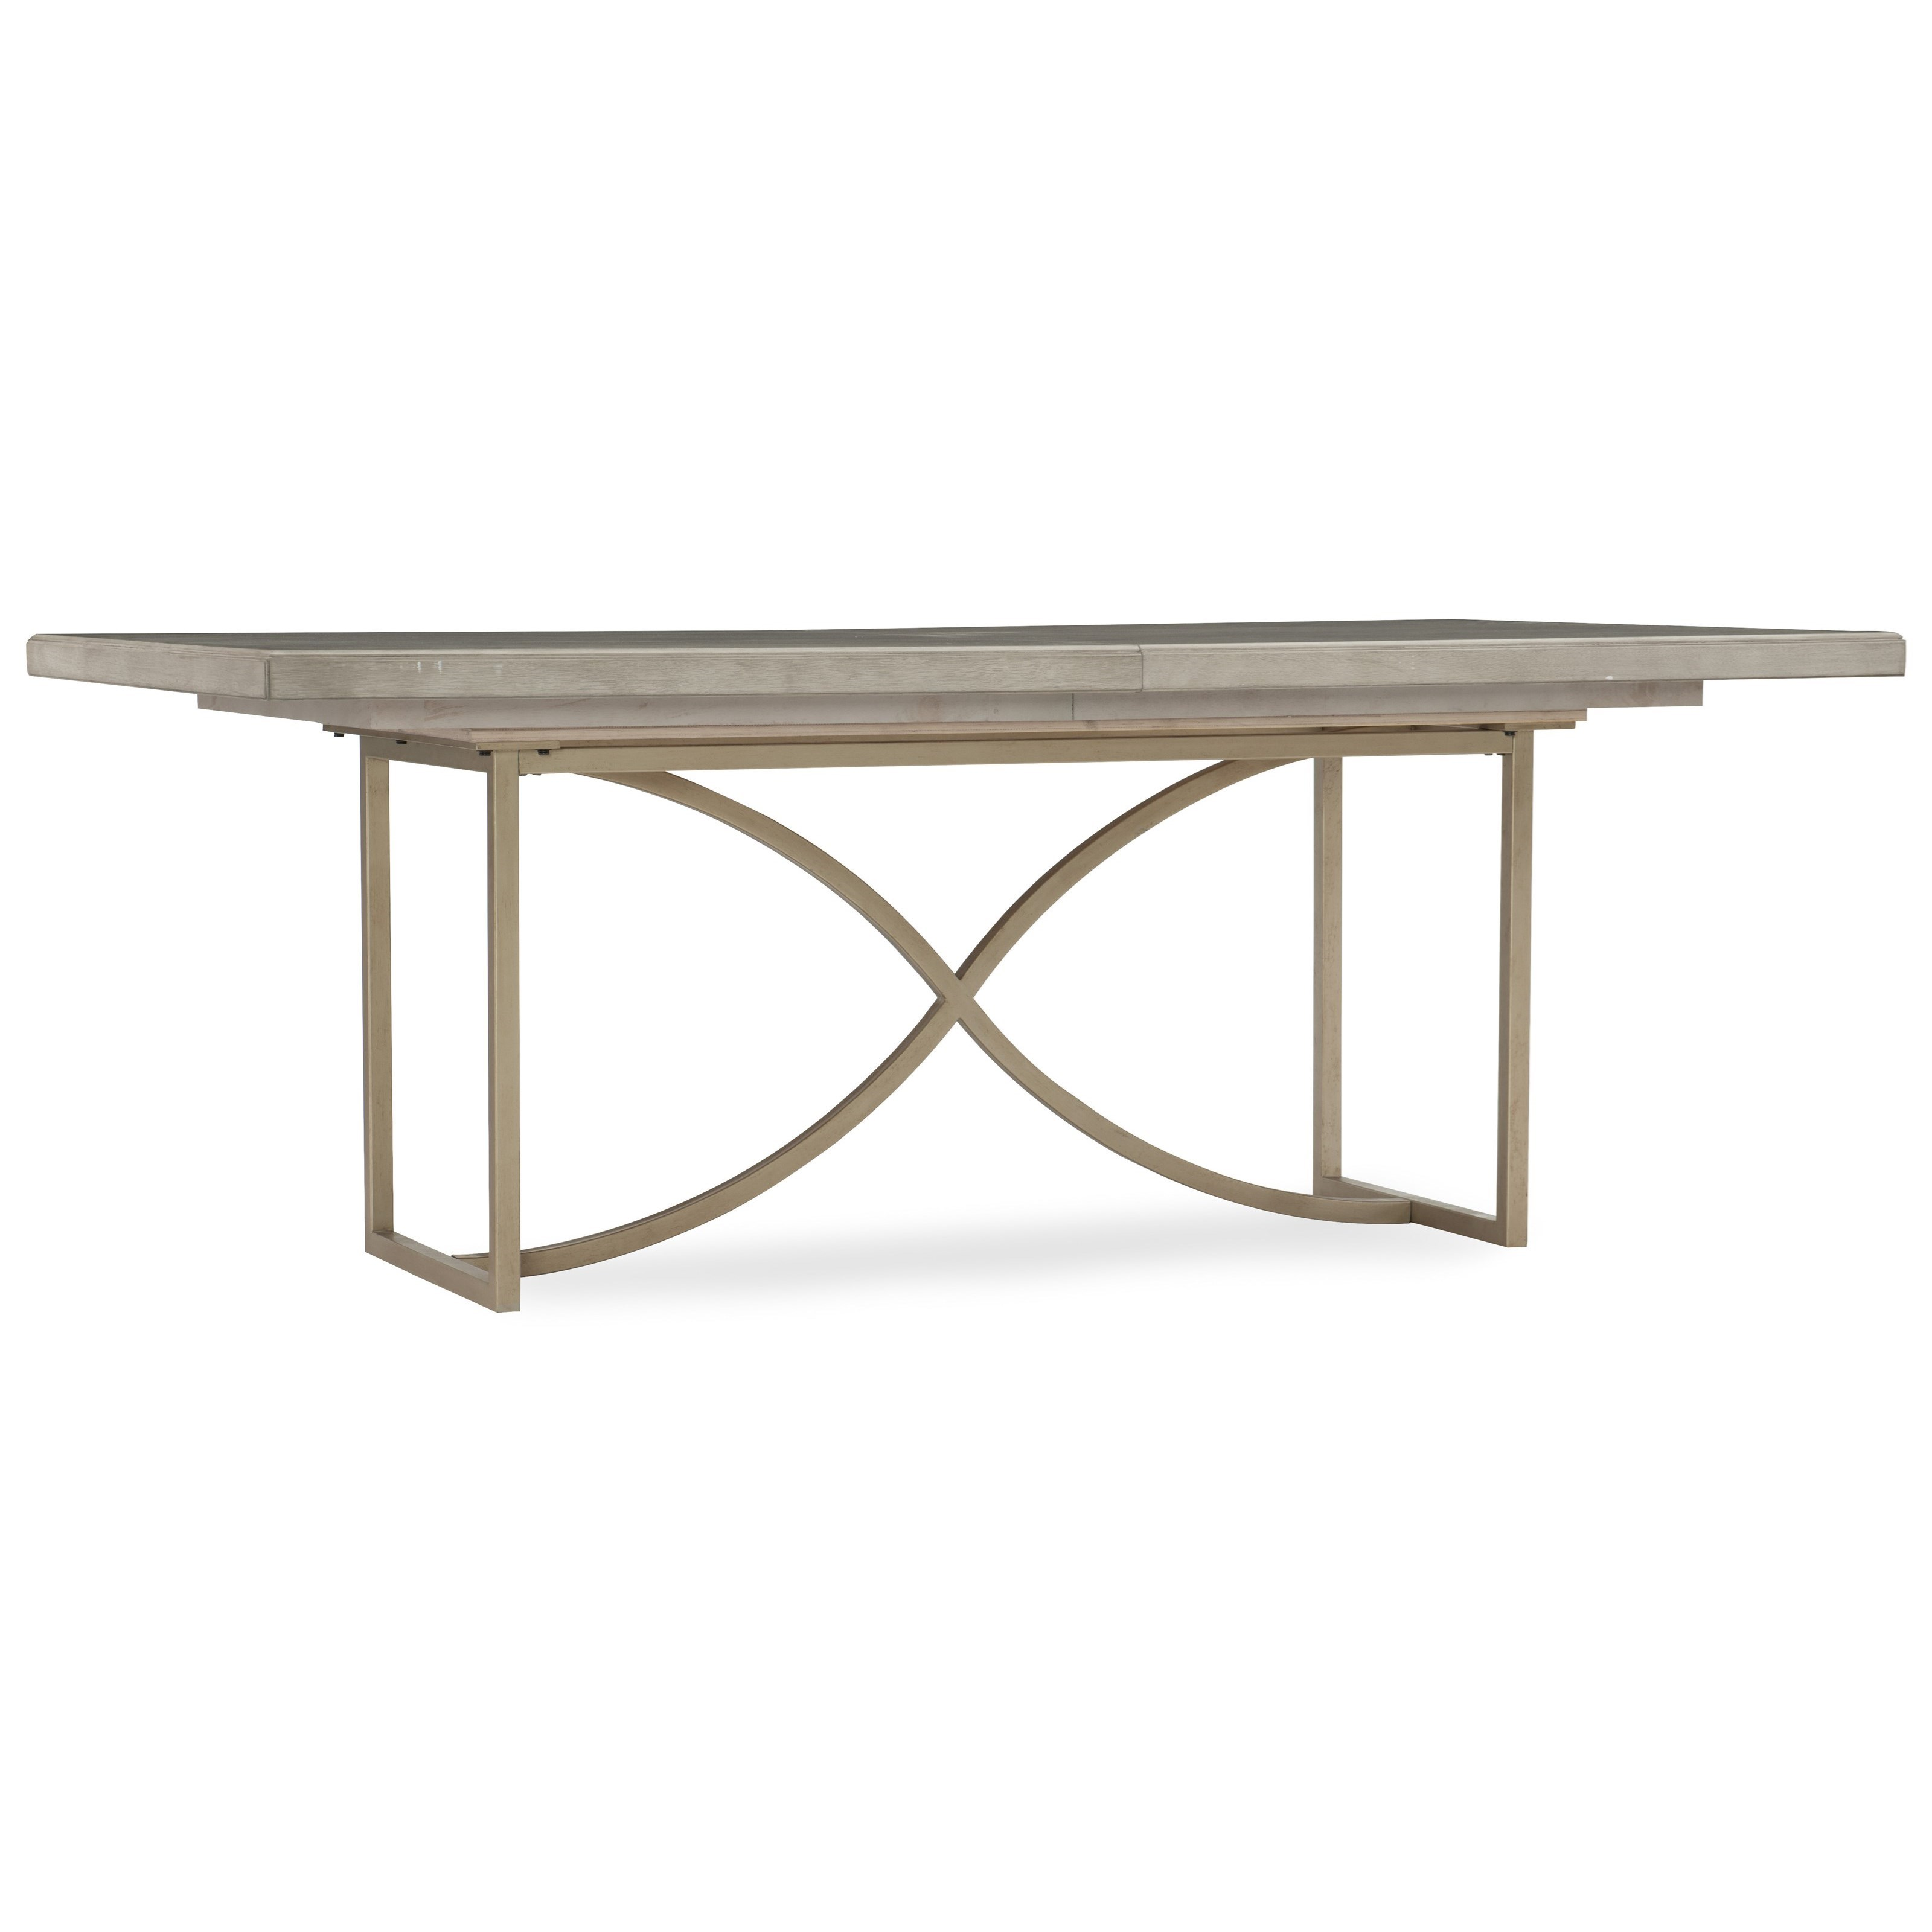 Hooker furniture elixir 80in rectangular dining table with for Rectangular dining room tables with leaves